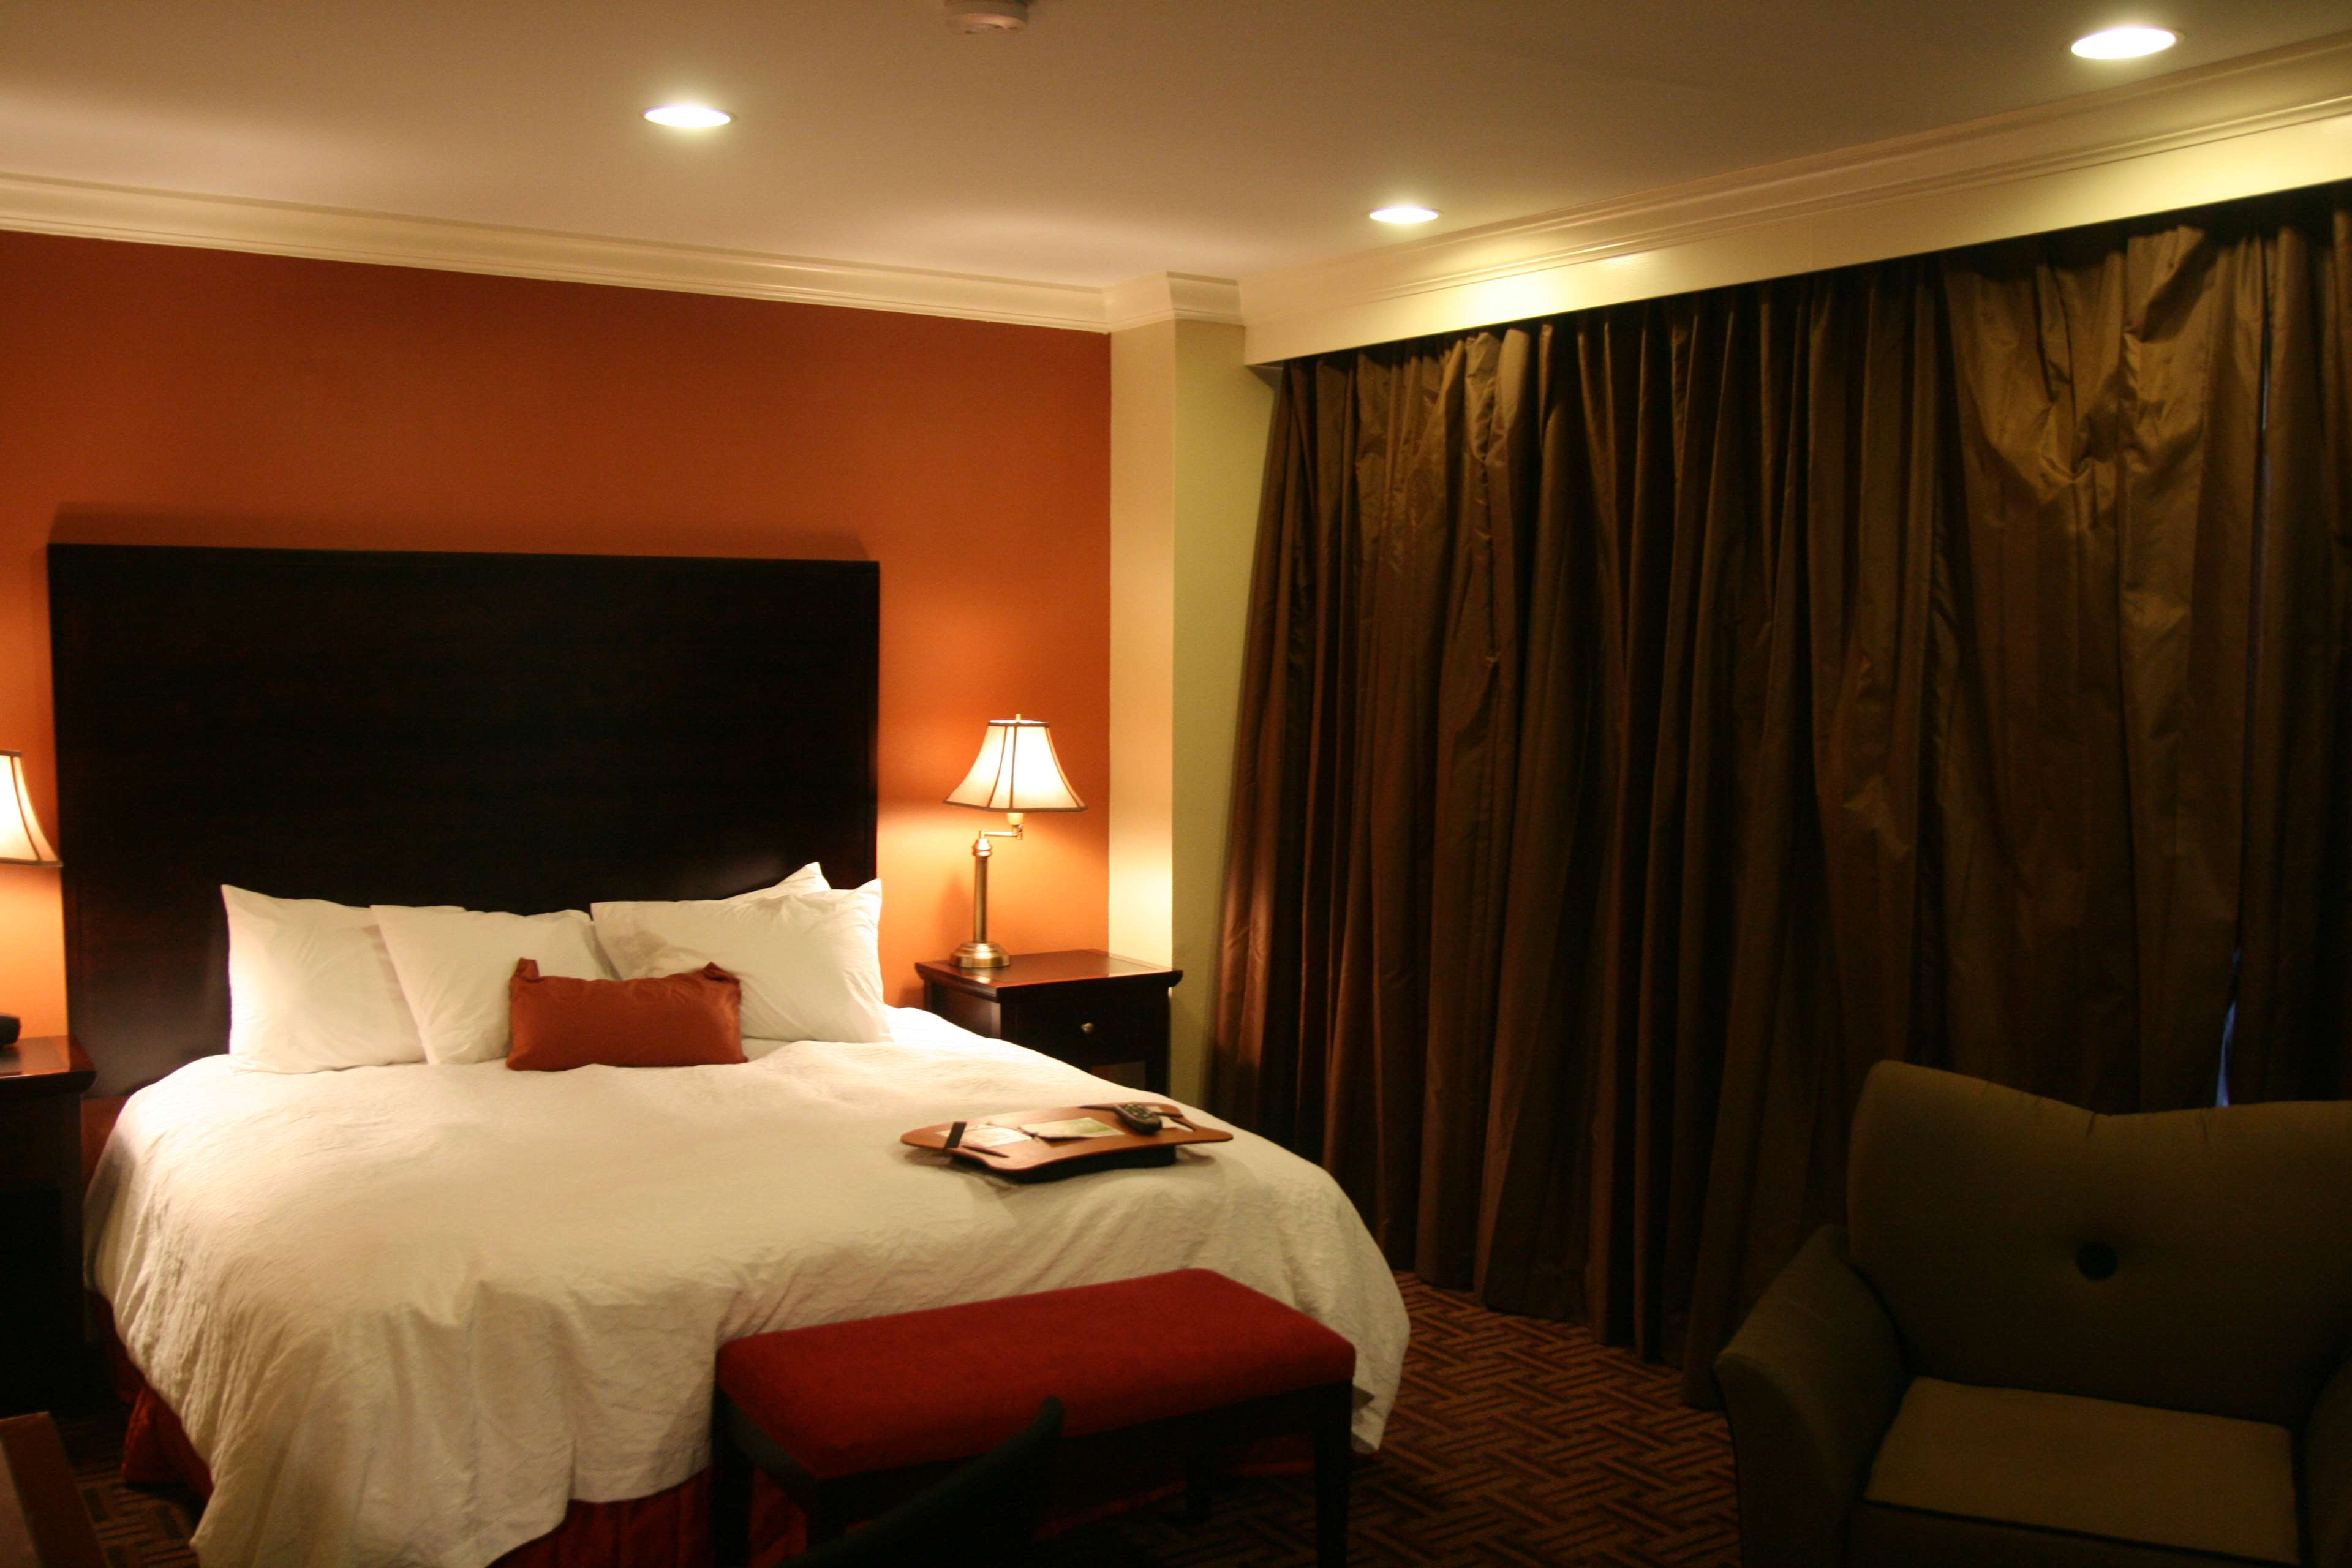 Hampton Inn & Suites Stamford image 20